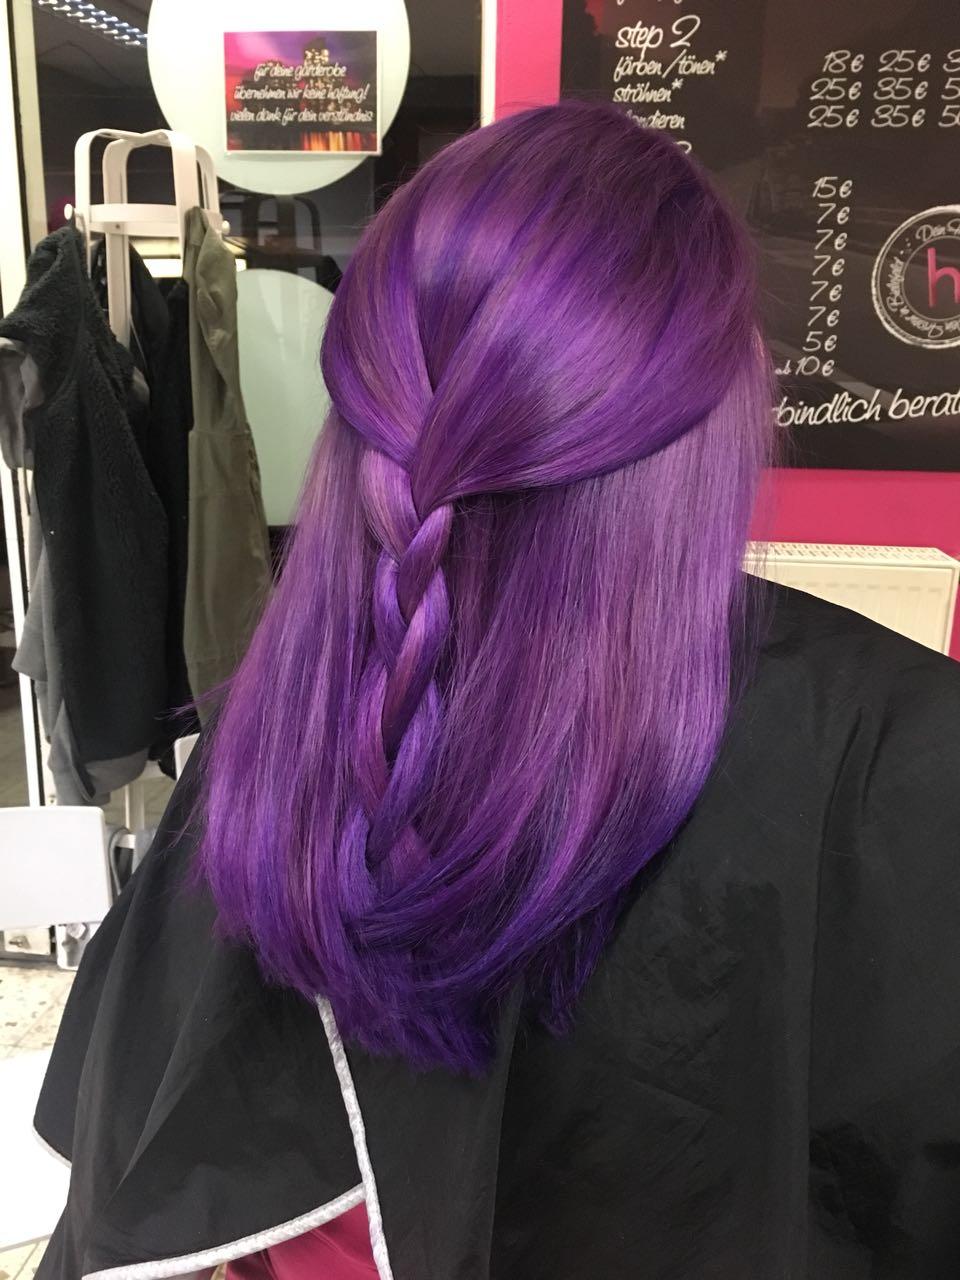 Lila Haare Farbe Bielefeld Friseur ohne termin